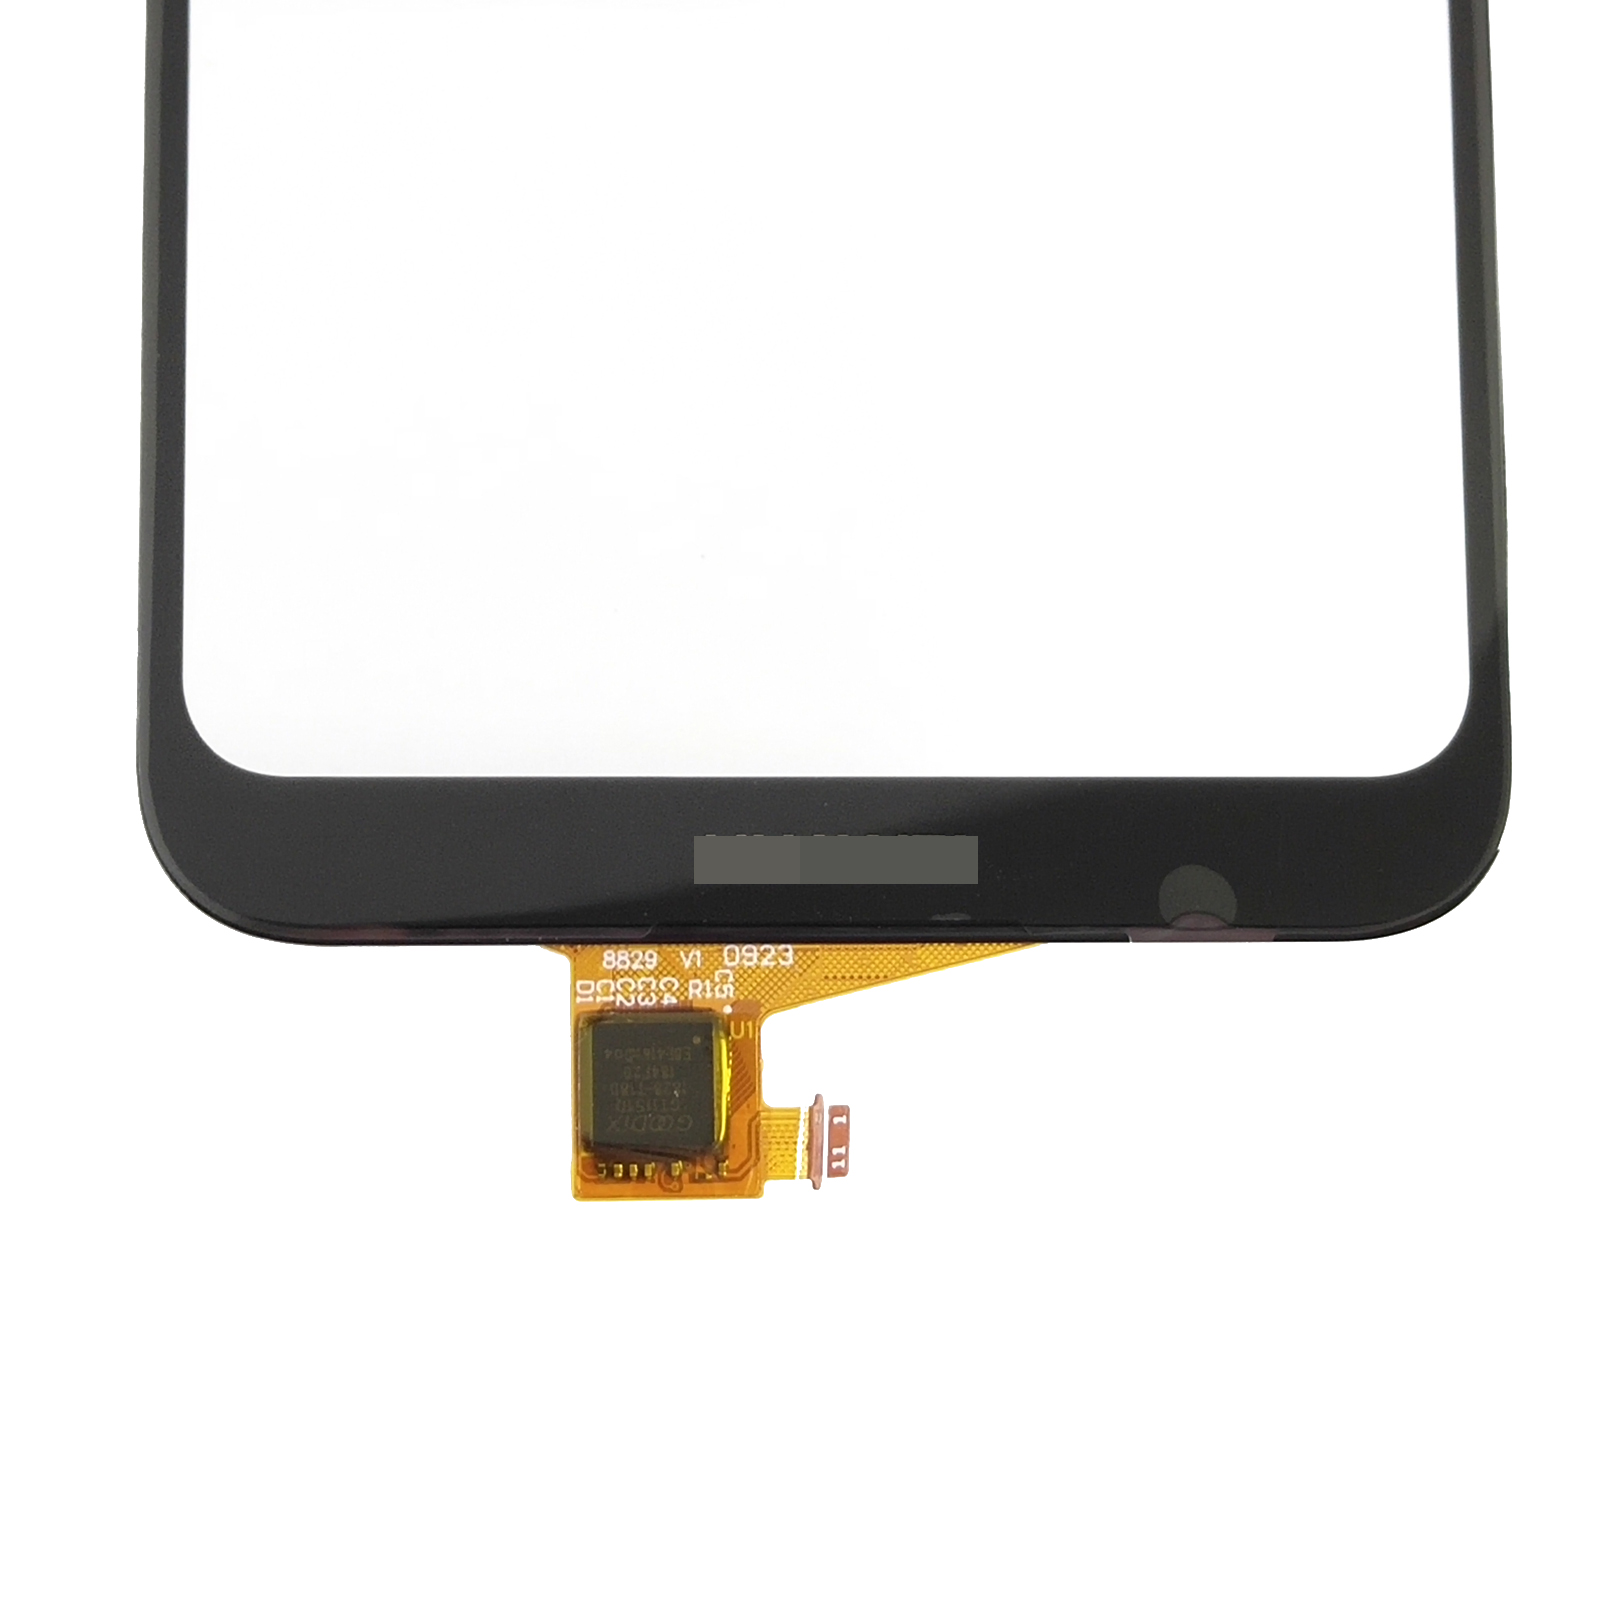 "פלאזמה Shyueda 100% בניו 6.09"" עבור Huawei Y6 Pro 2019 MRD-LX2 L22 L23 Outer חזית זכוכית מסך מגע (5)"